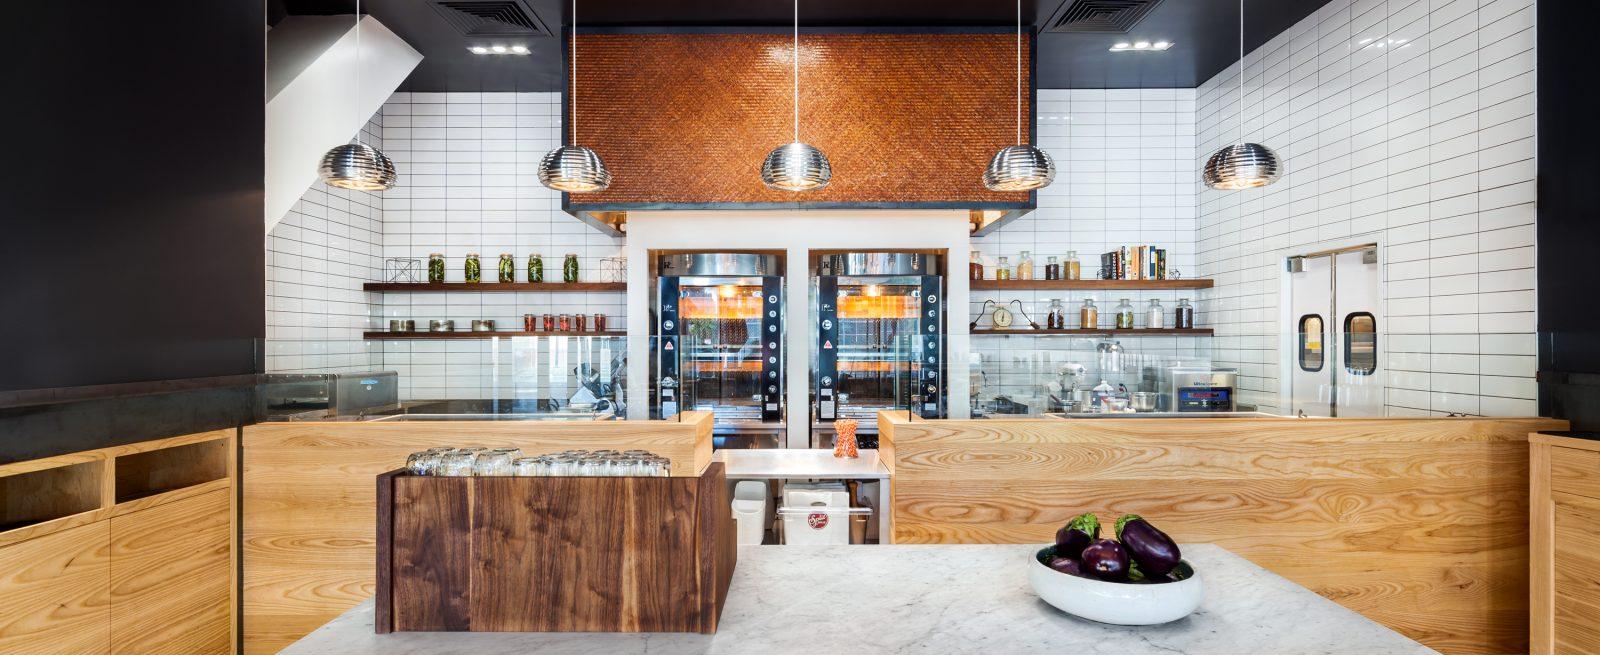 Eight Ways Restaurants Can Prepare For A New Normal Modern Restaurant Management The Business Of Eating Restaurant Management News